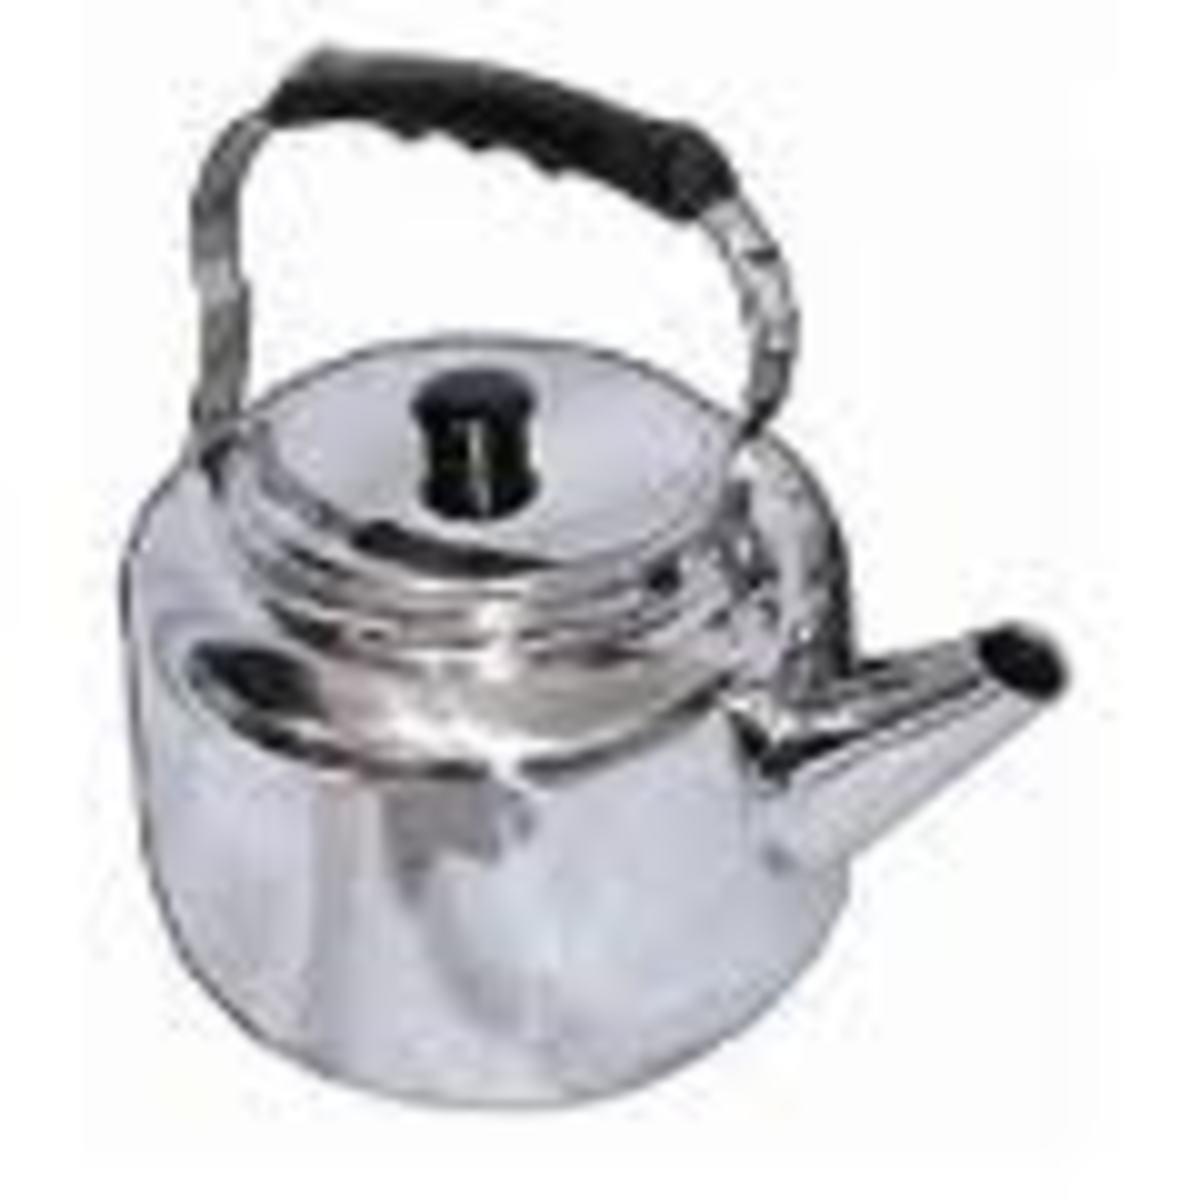 Heavy duty stainless tea kettle